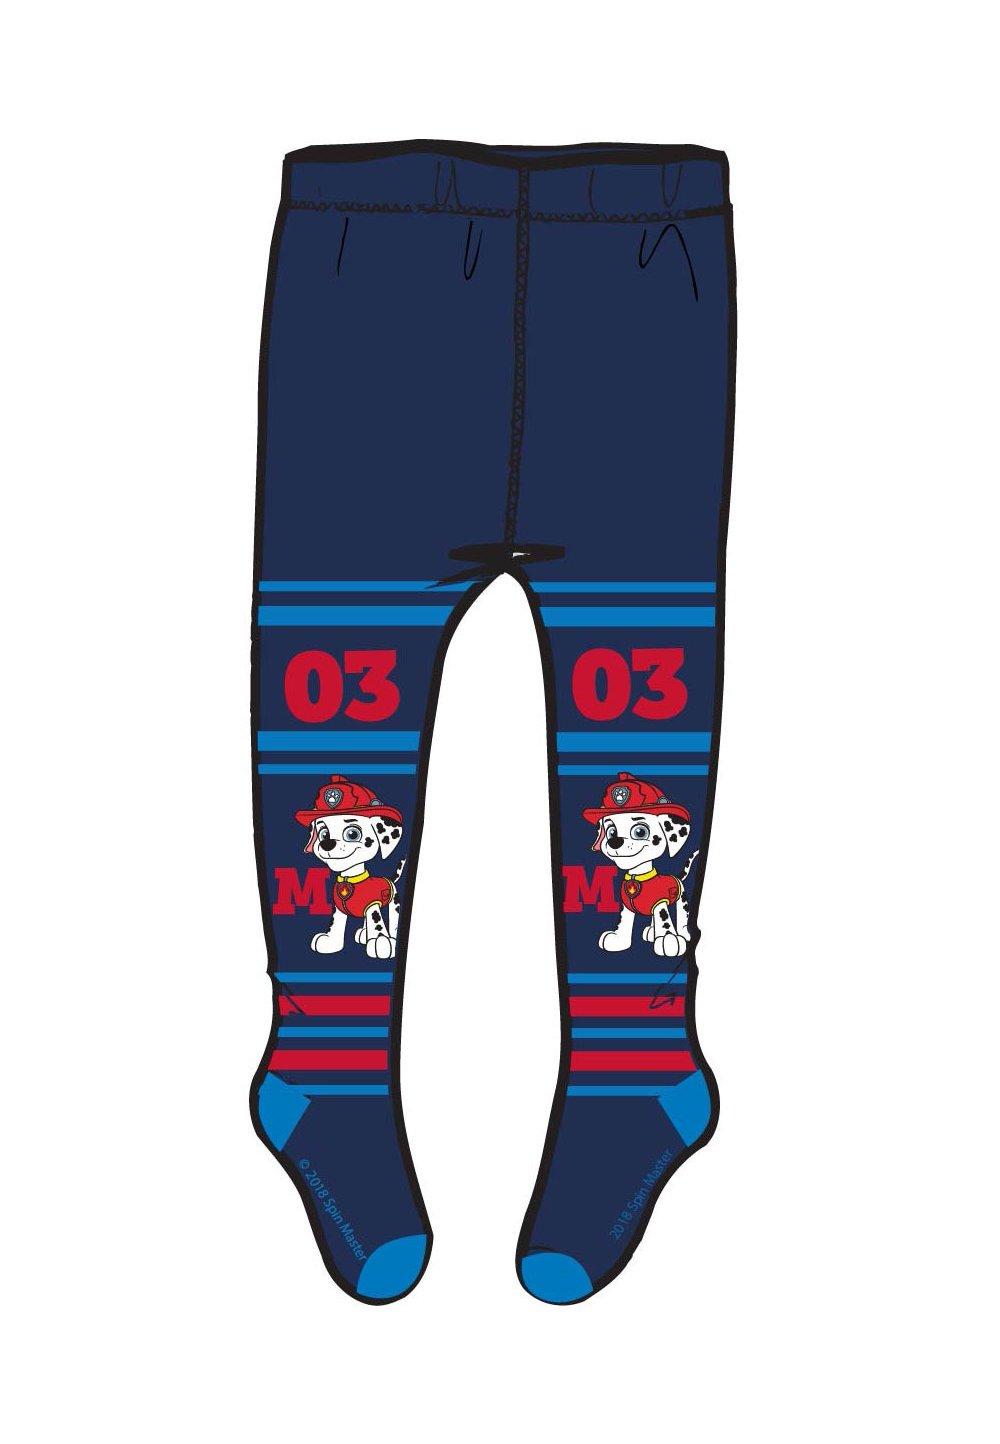 Ciorapi cu chilot, Marshall, bluemarin imagine